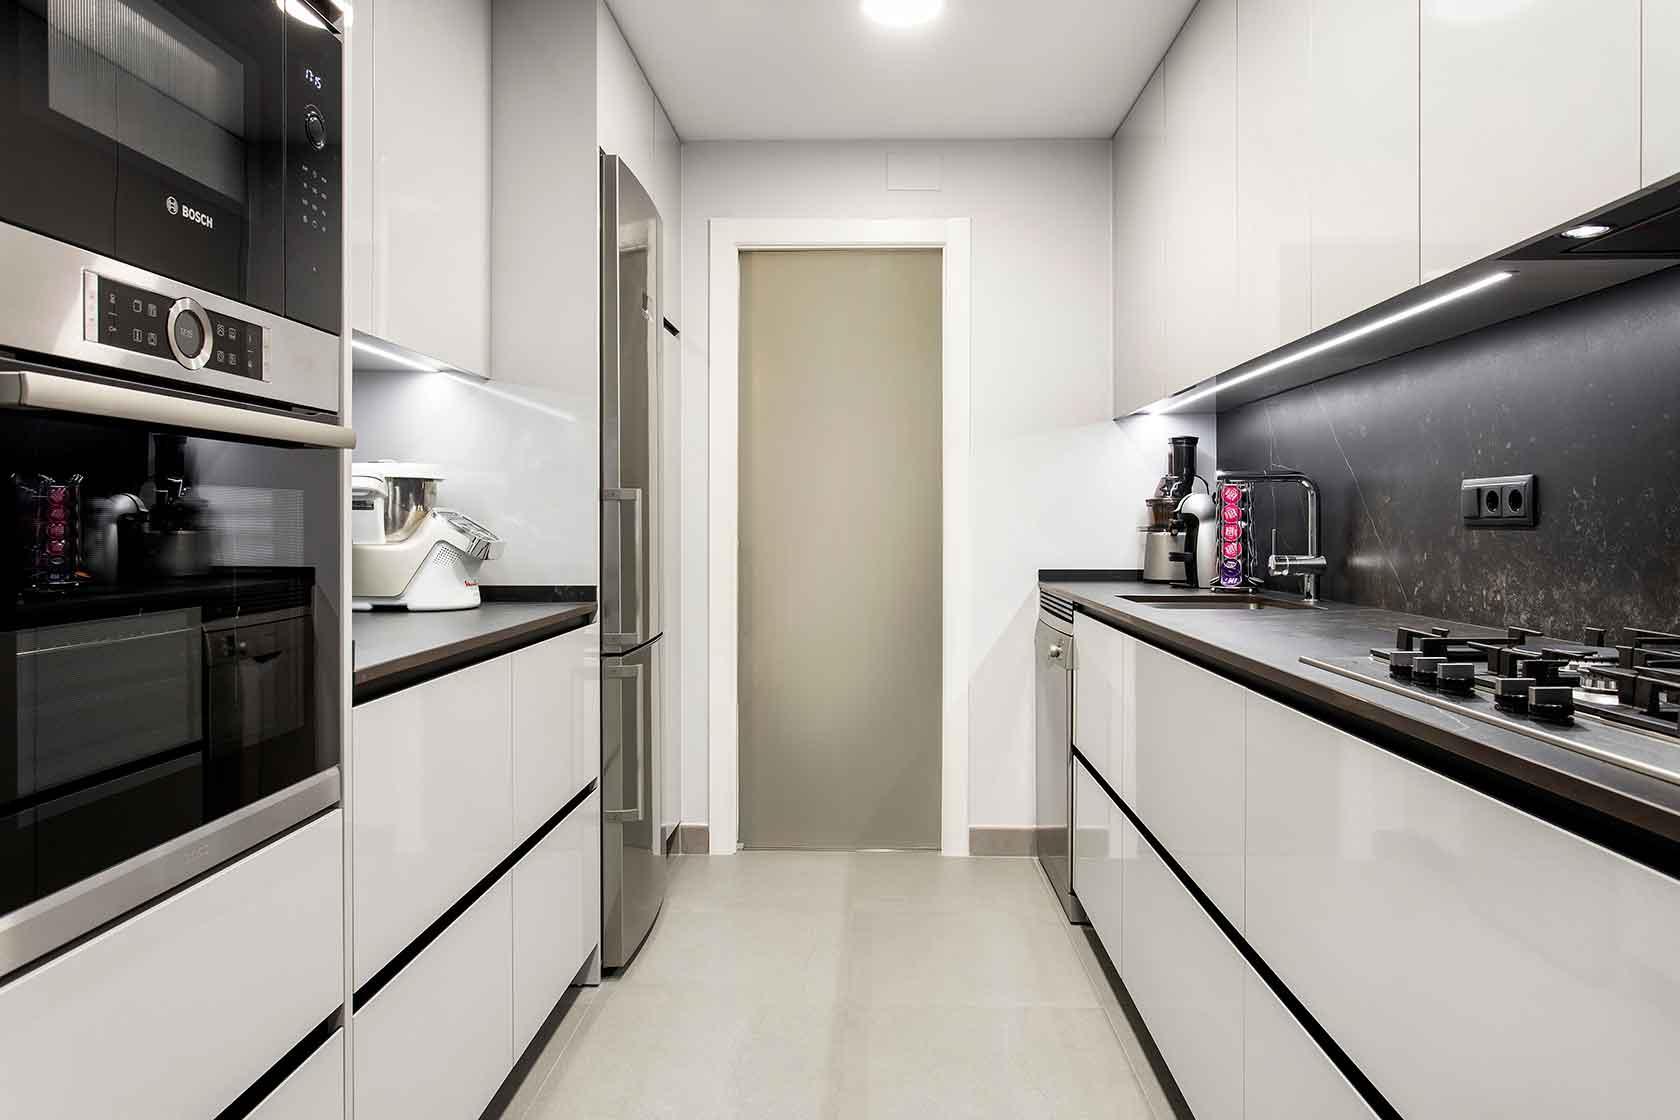 Reforma de cocina integral en Sants-Montjuïc